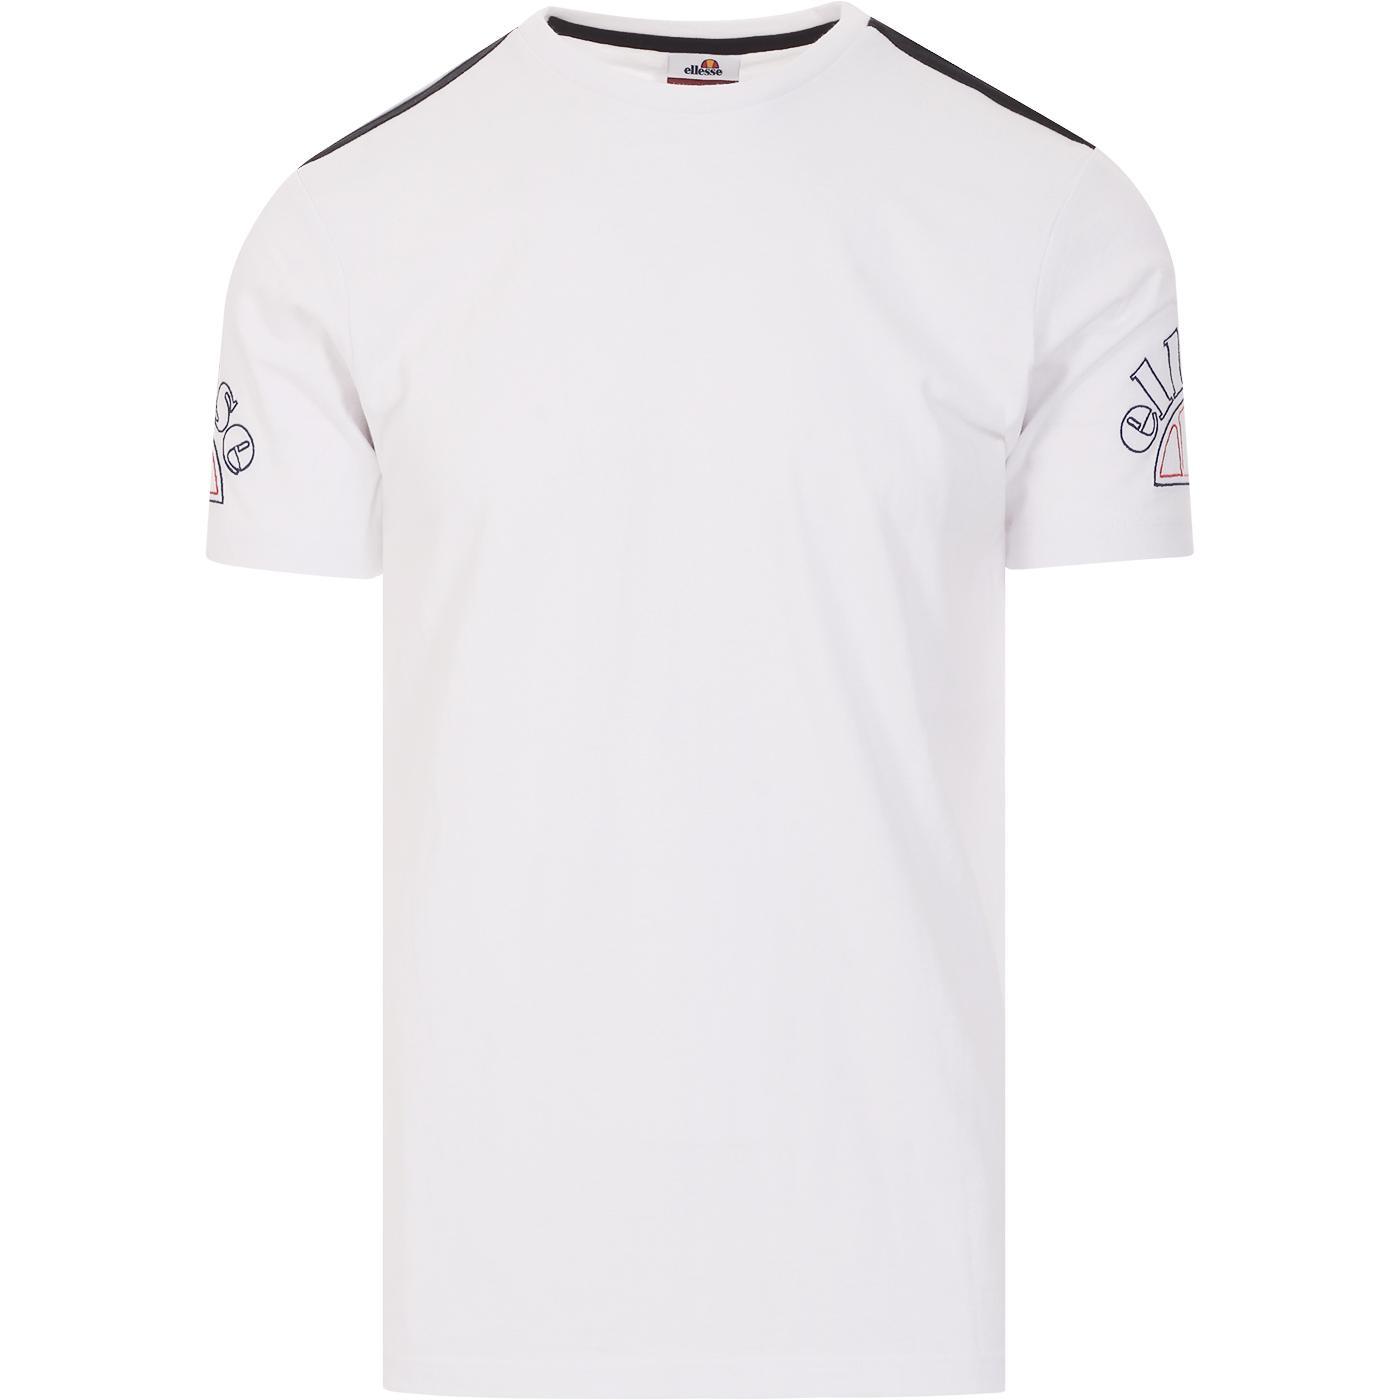 Mauro ELLESSE Embroidered Sleeve Logo Tee (White)